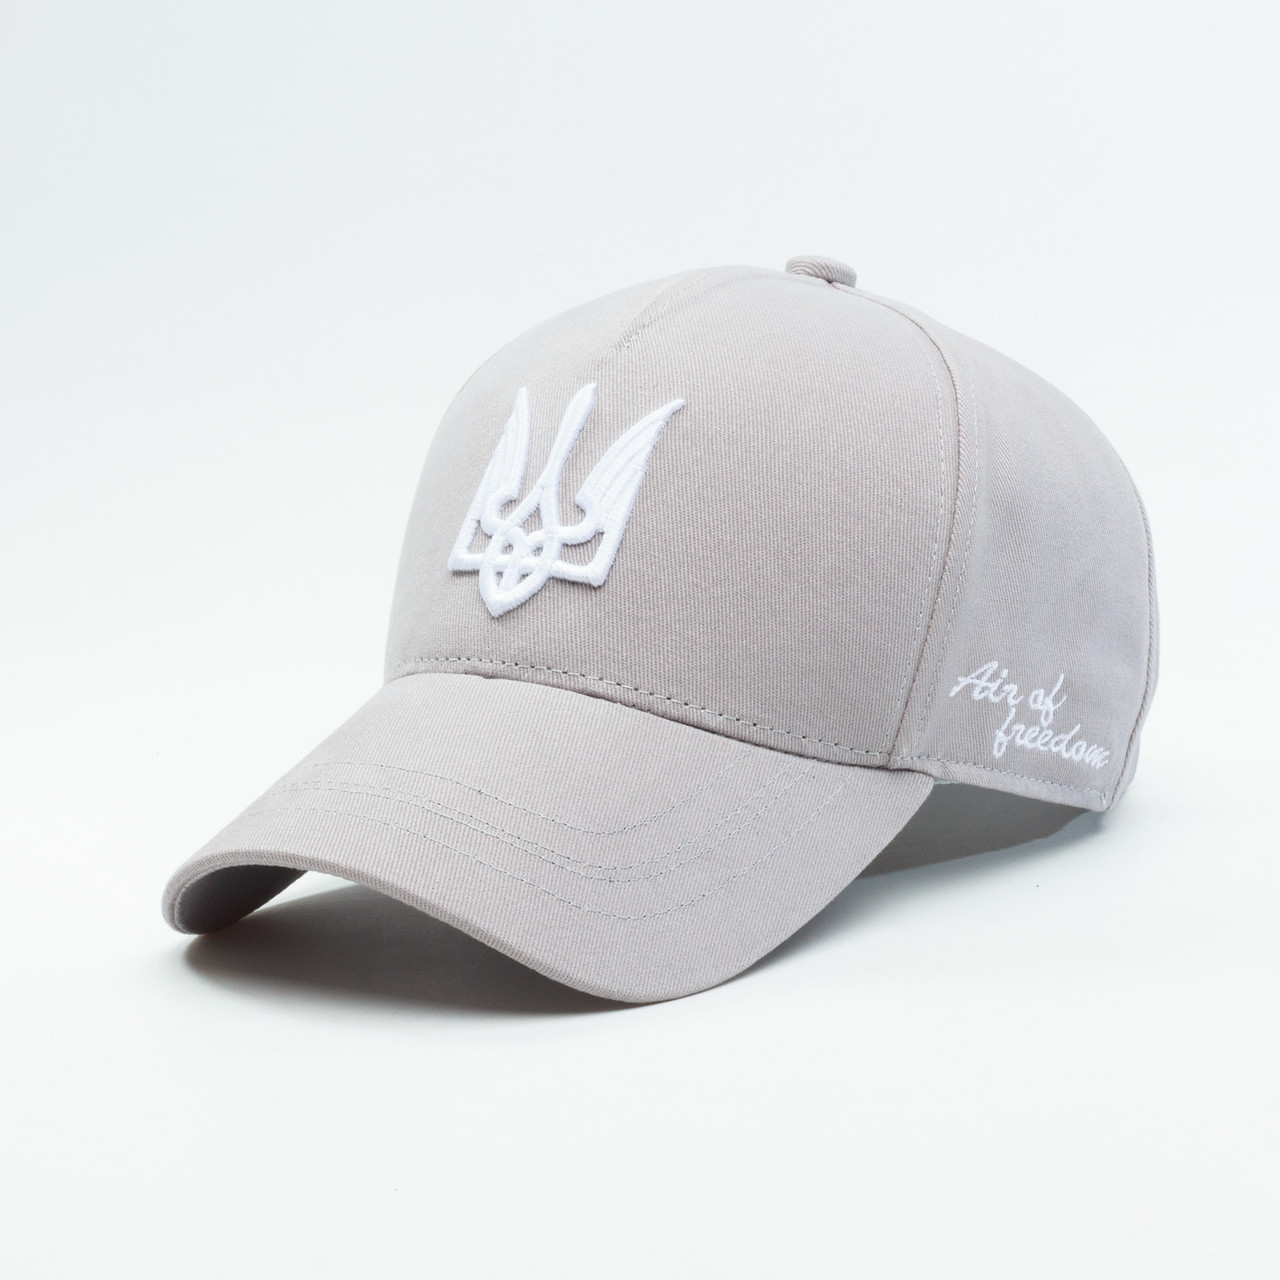 Купить Кепка бейсболка мужская INAL air of freedom XL / 59-60 RU Серый 37459